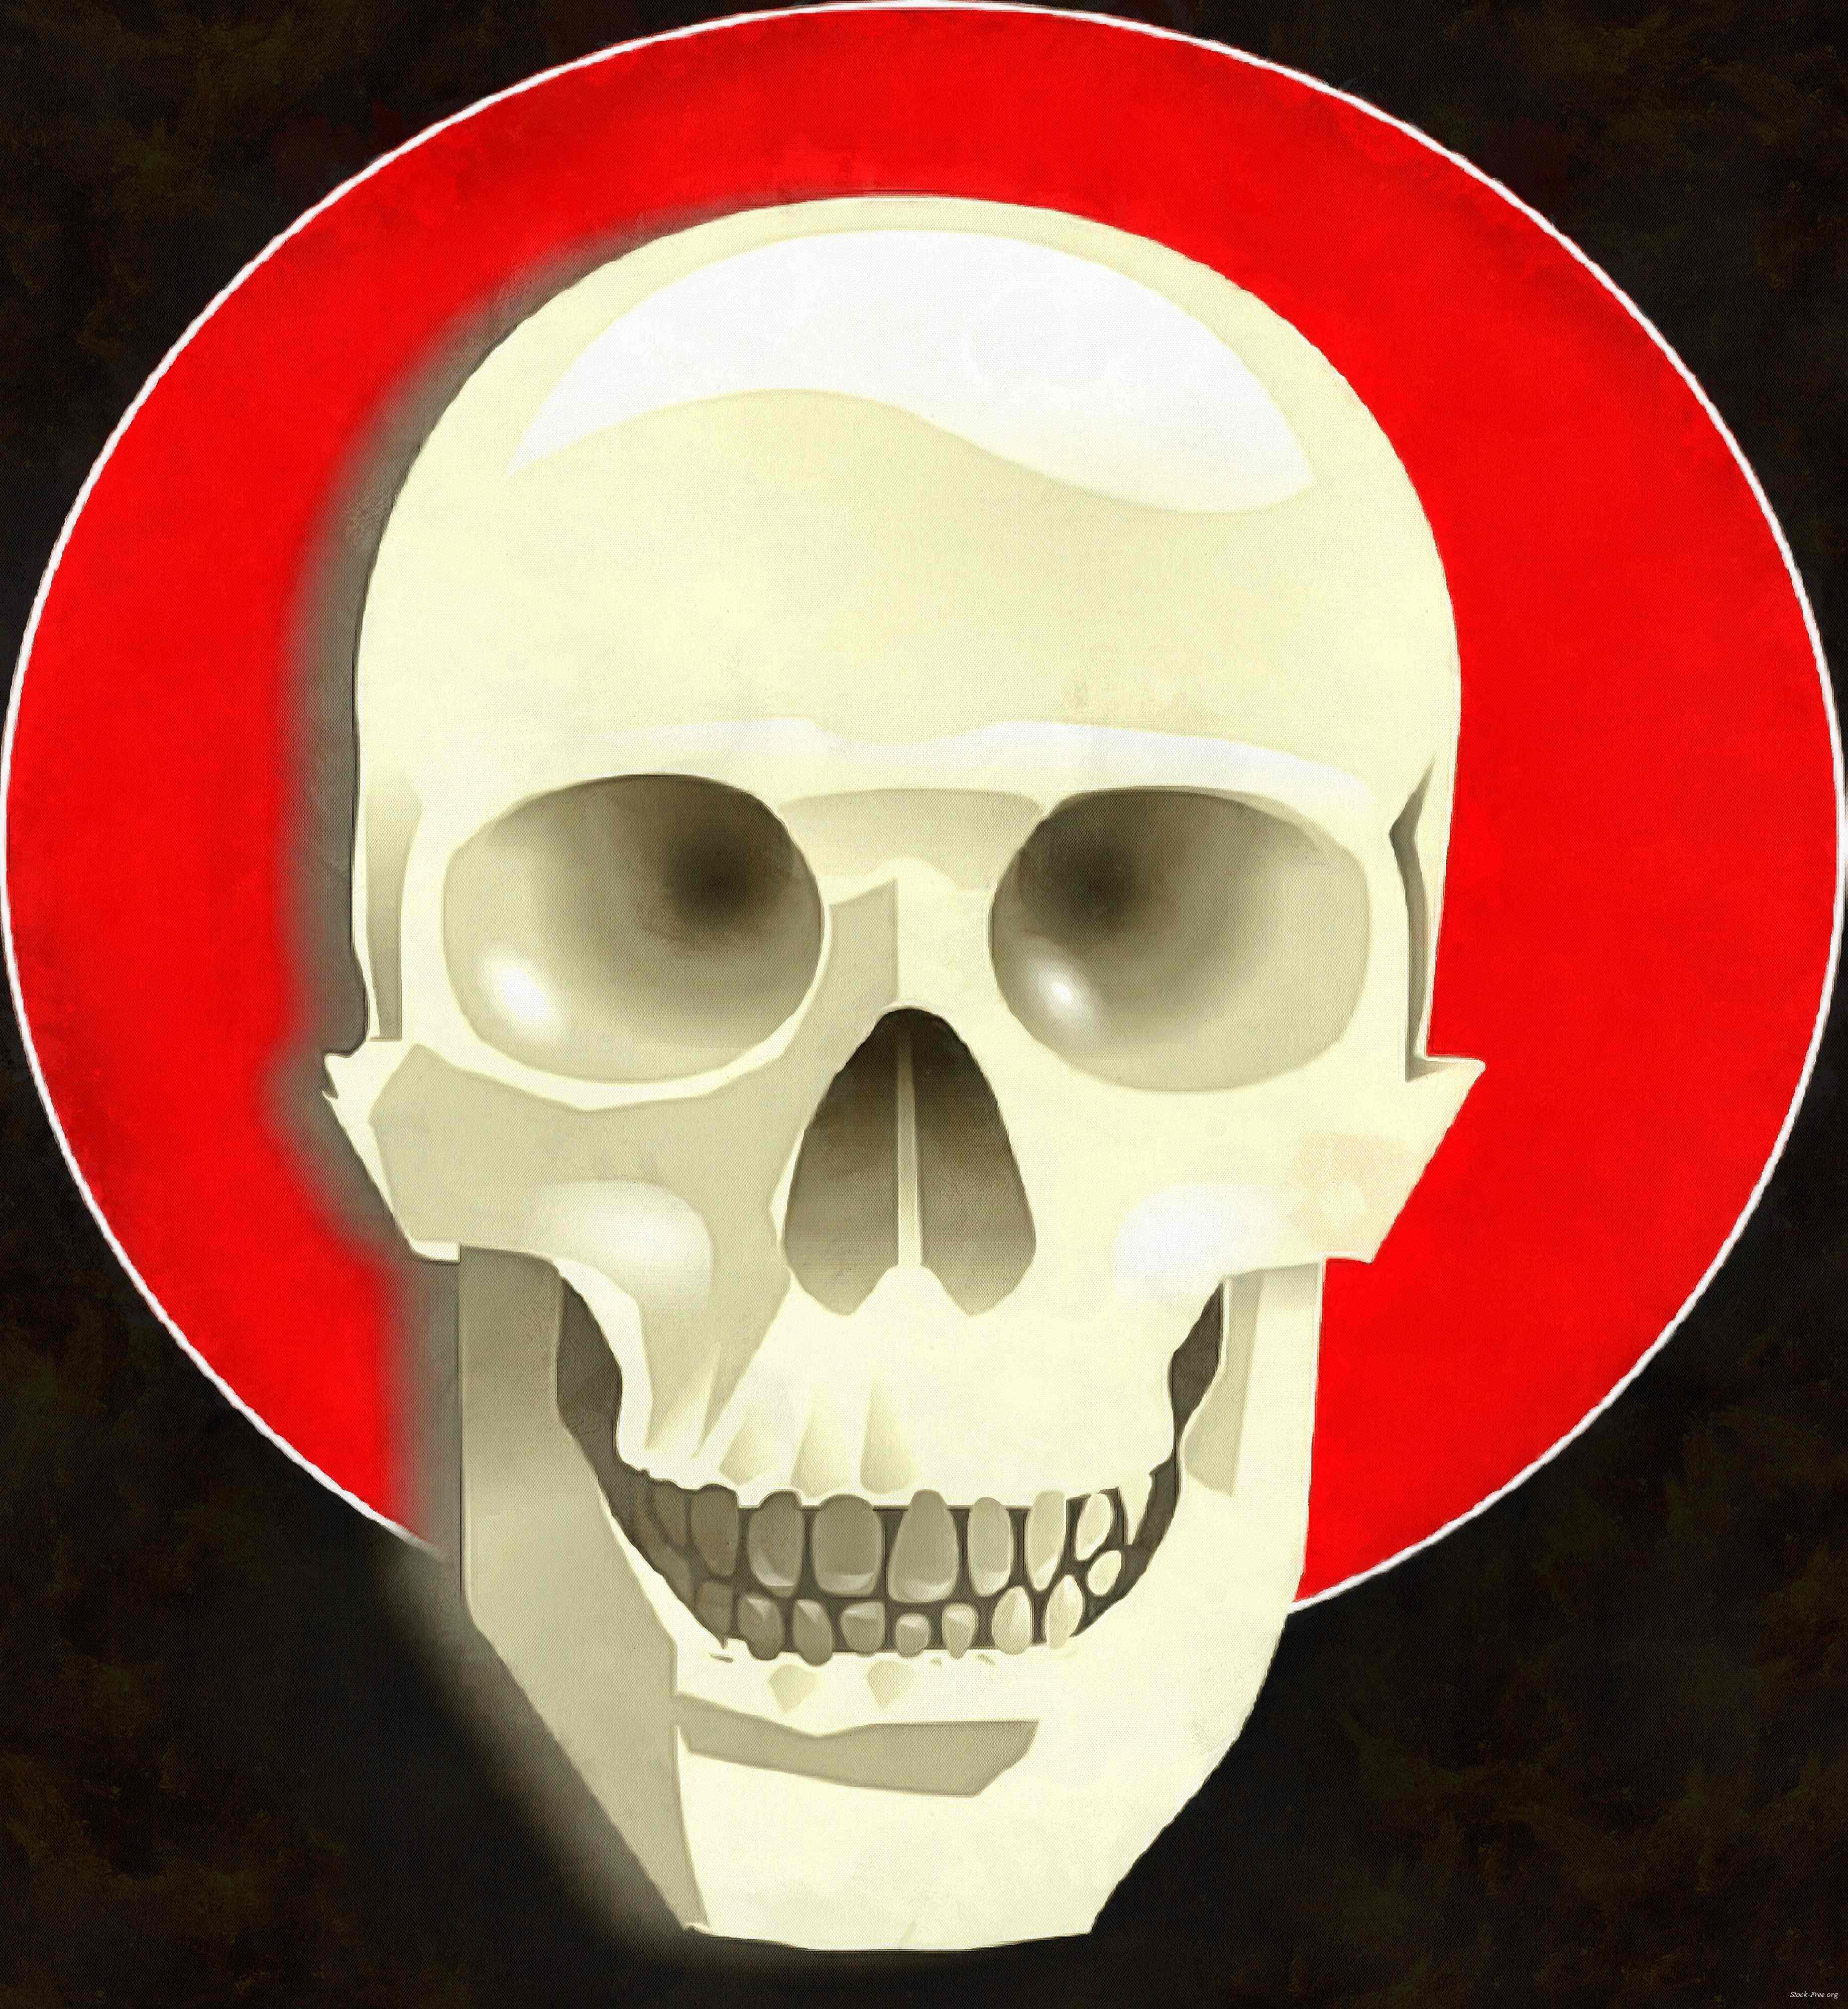 skull, head, bones, horror, skeleton, fear, smile, halloween - halloween free image, free images, public domain images, stock free images, download image for free, halloween stock free images